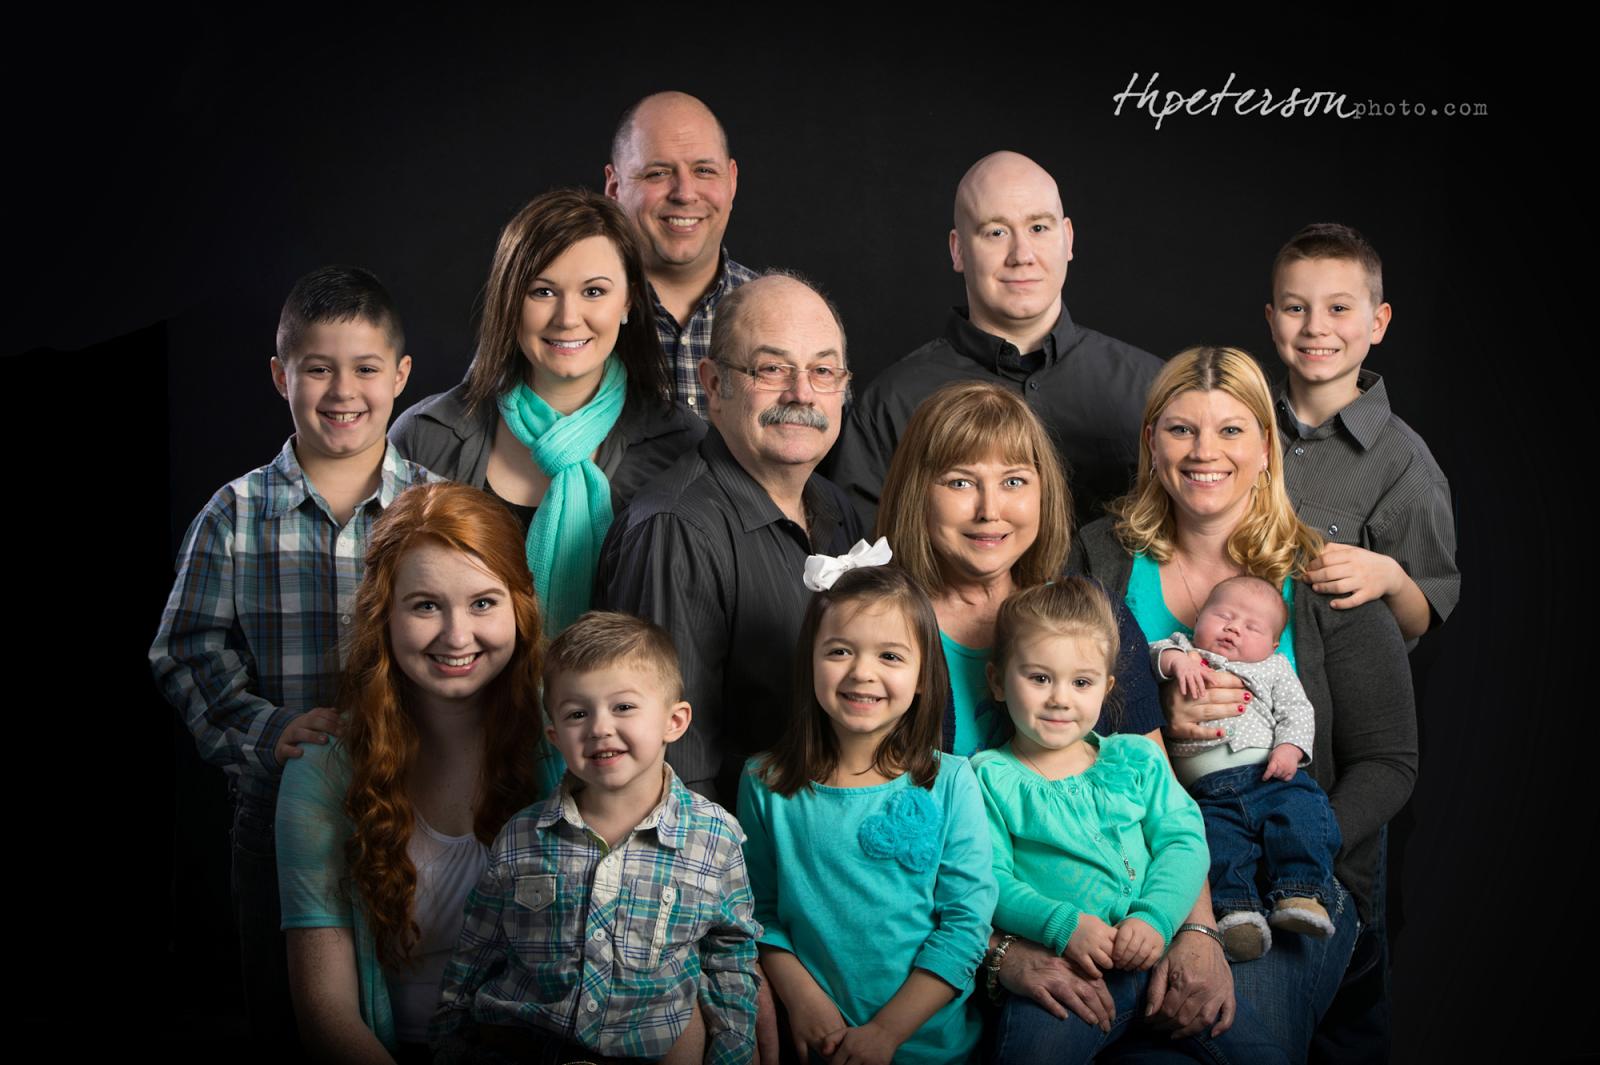 Family Graduation Photo Studio Portrait Makeover Glamour Family portrait photography price list